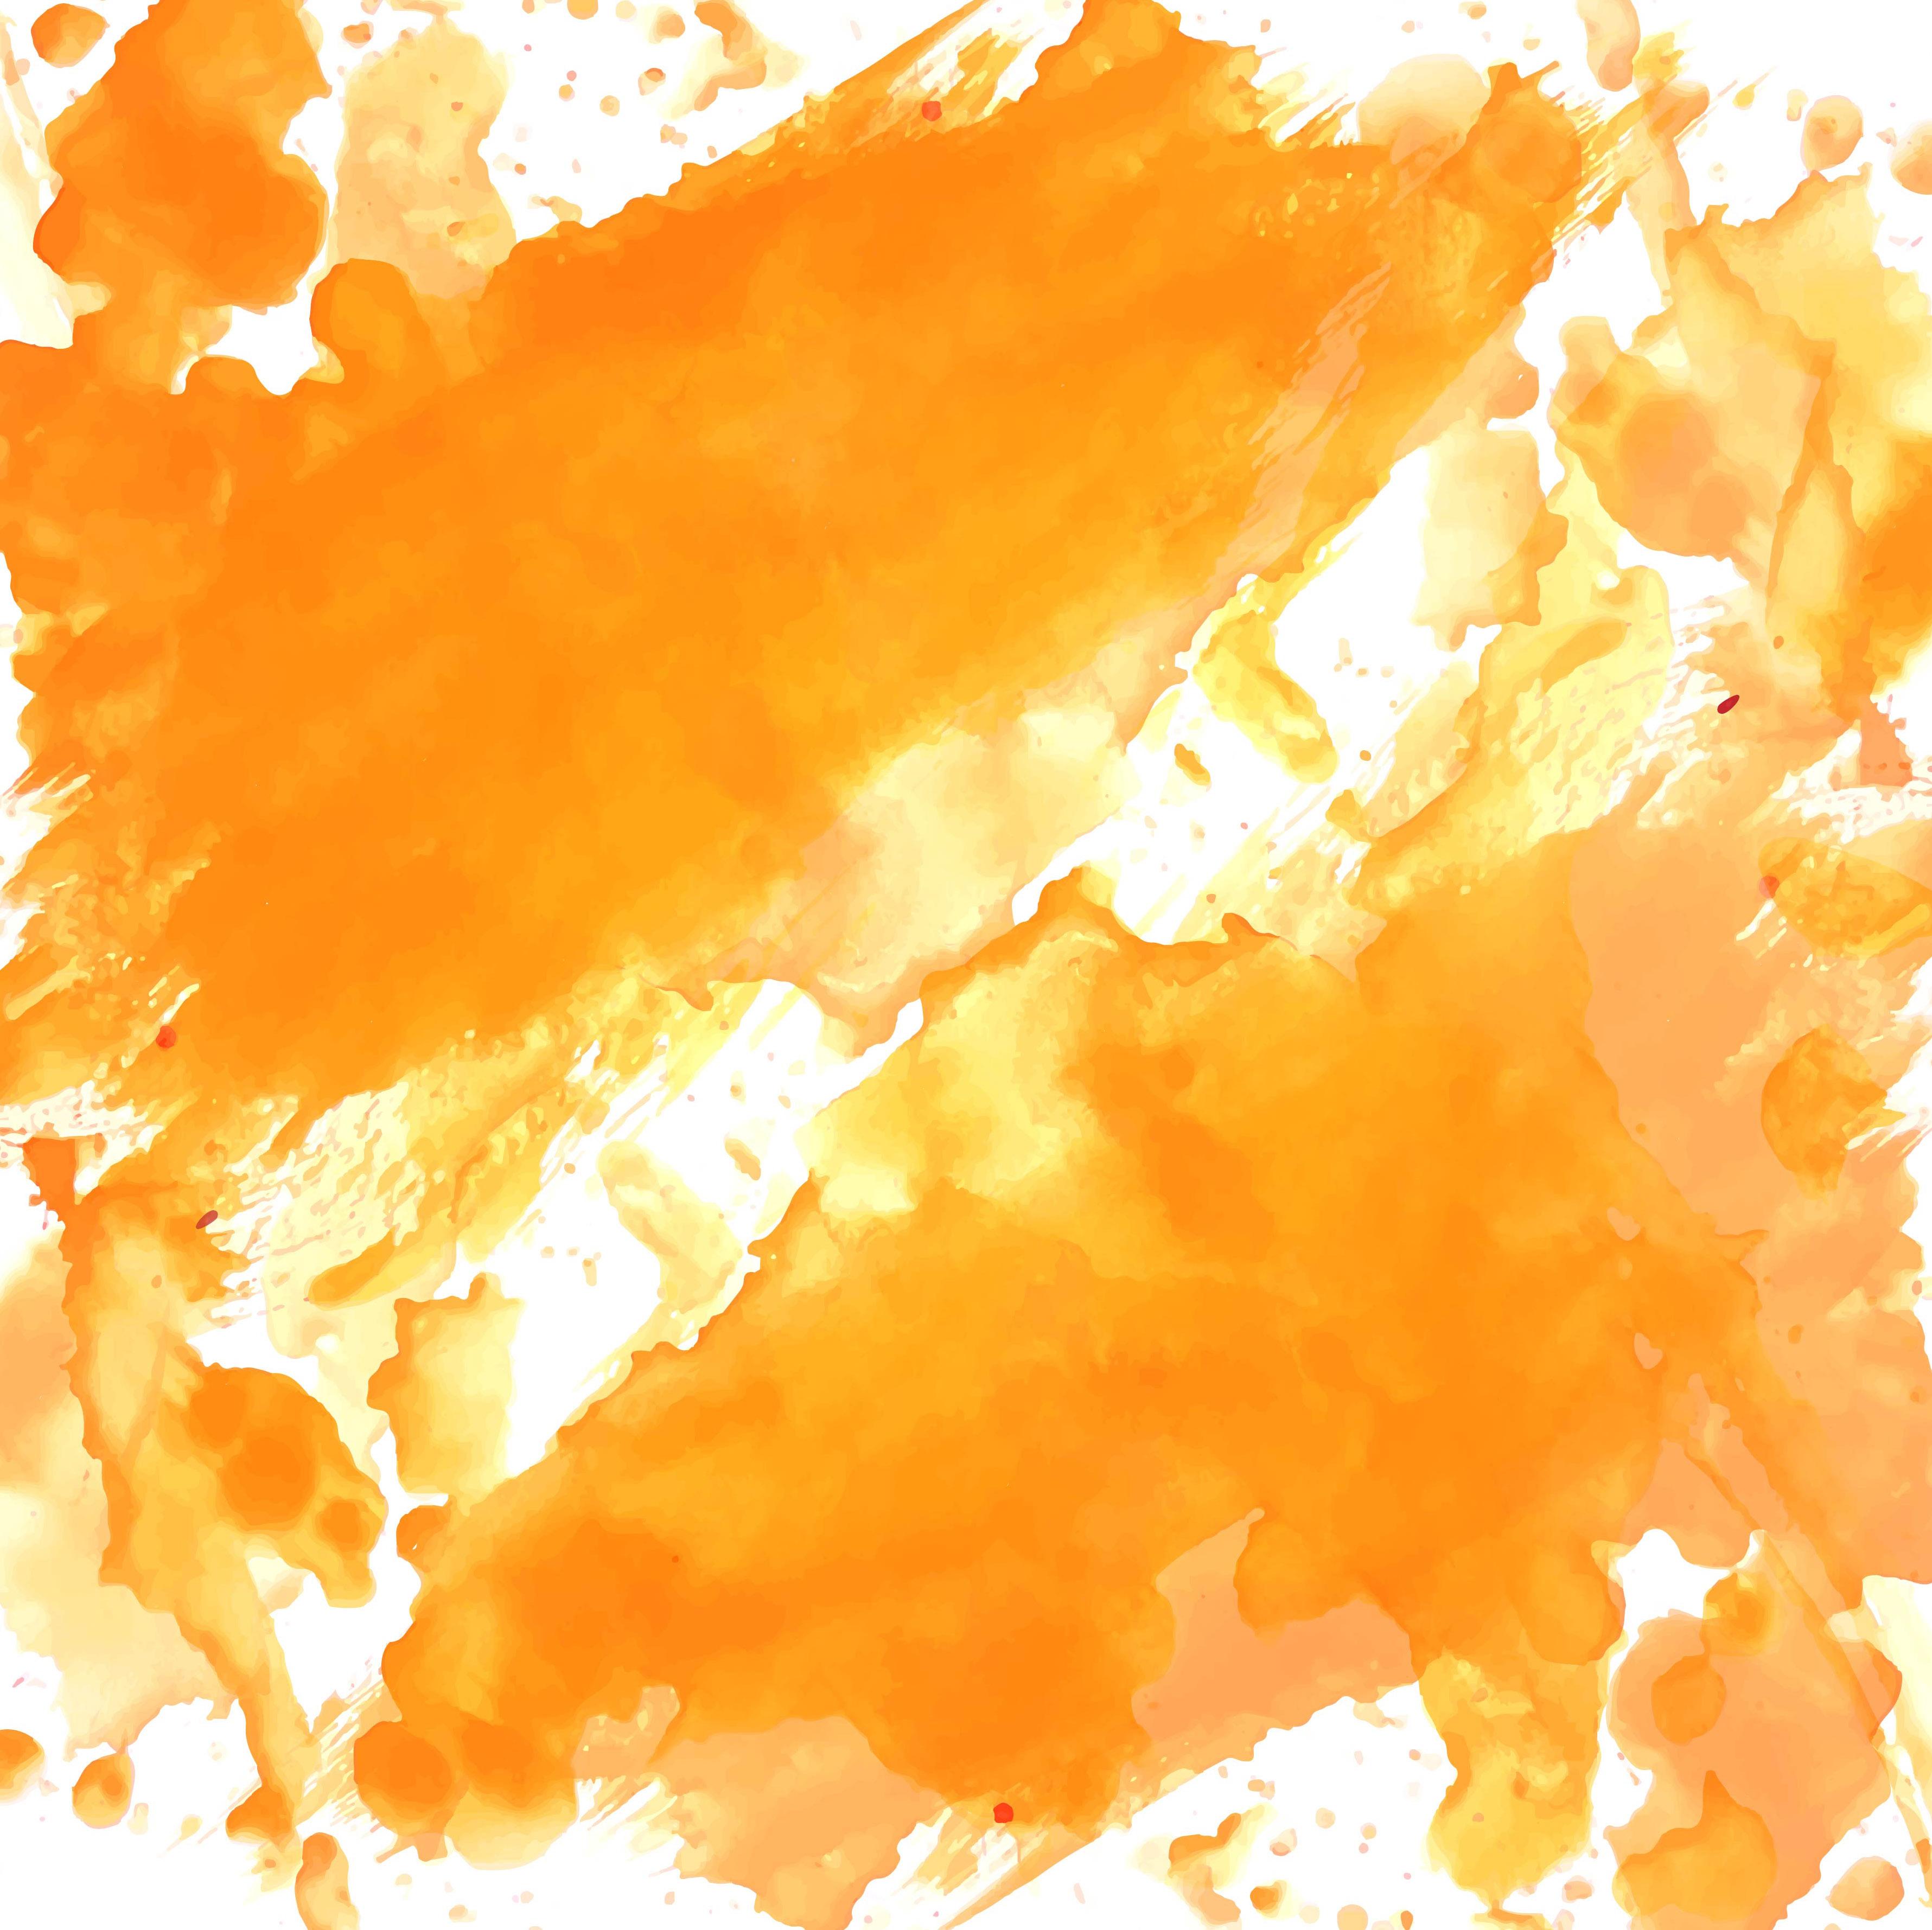 modern orange watercolor background